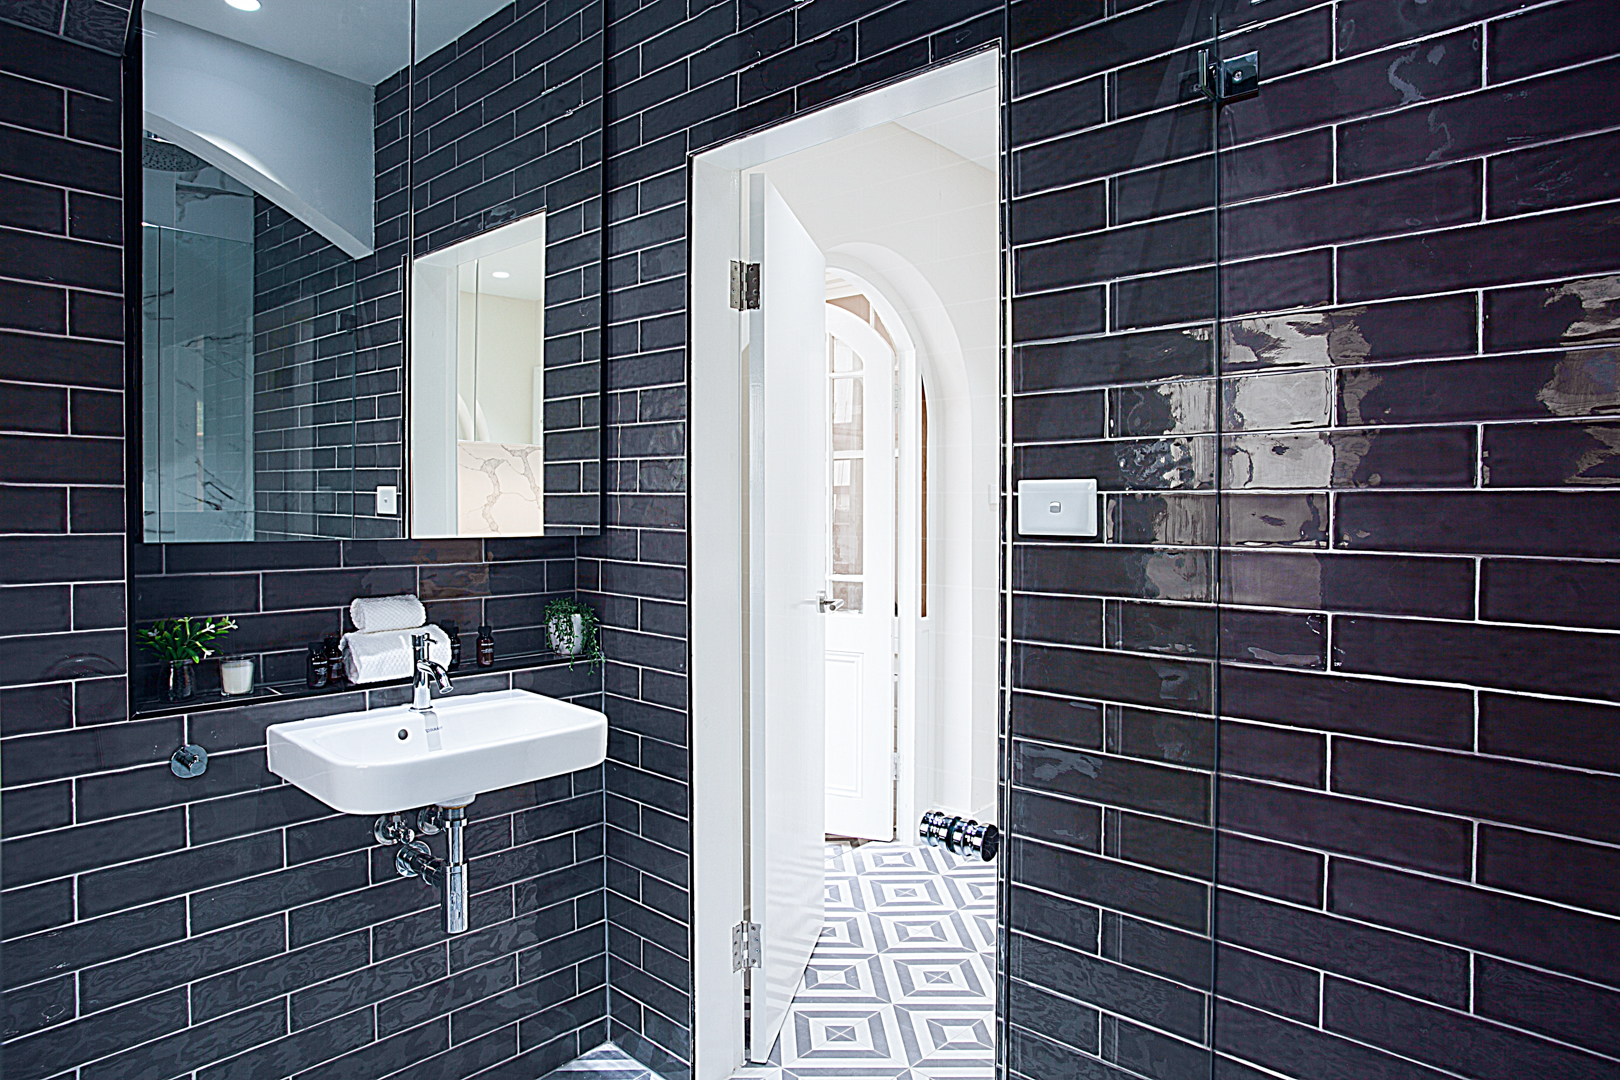 Black tiles at The Miller Apartment, The Rocks, Sydney